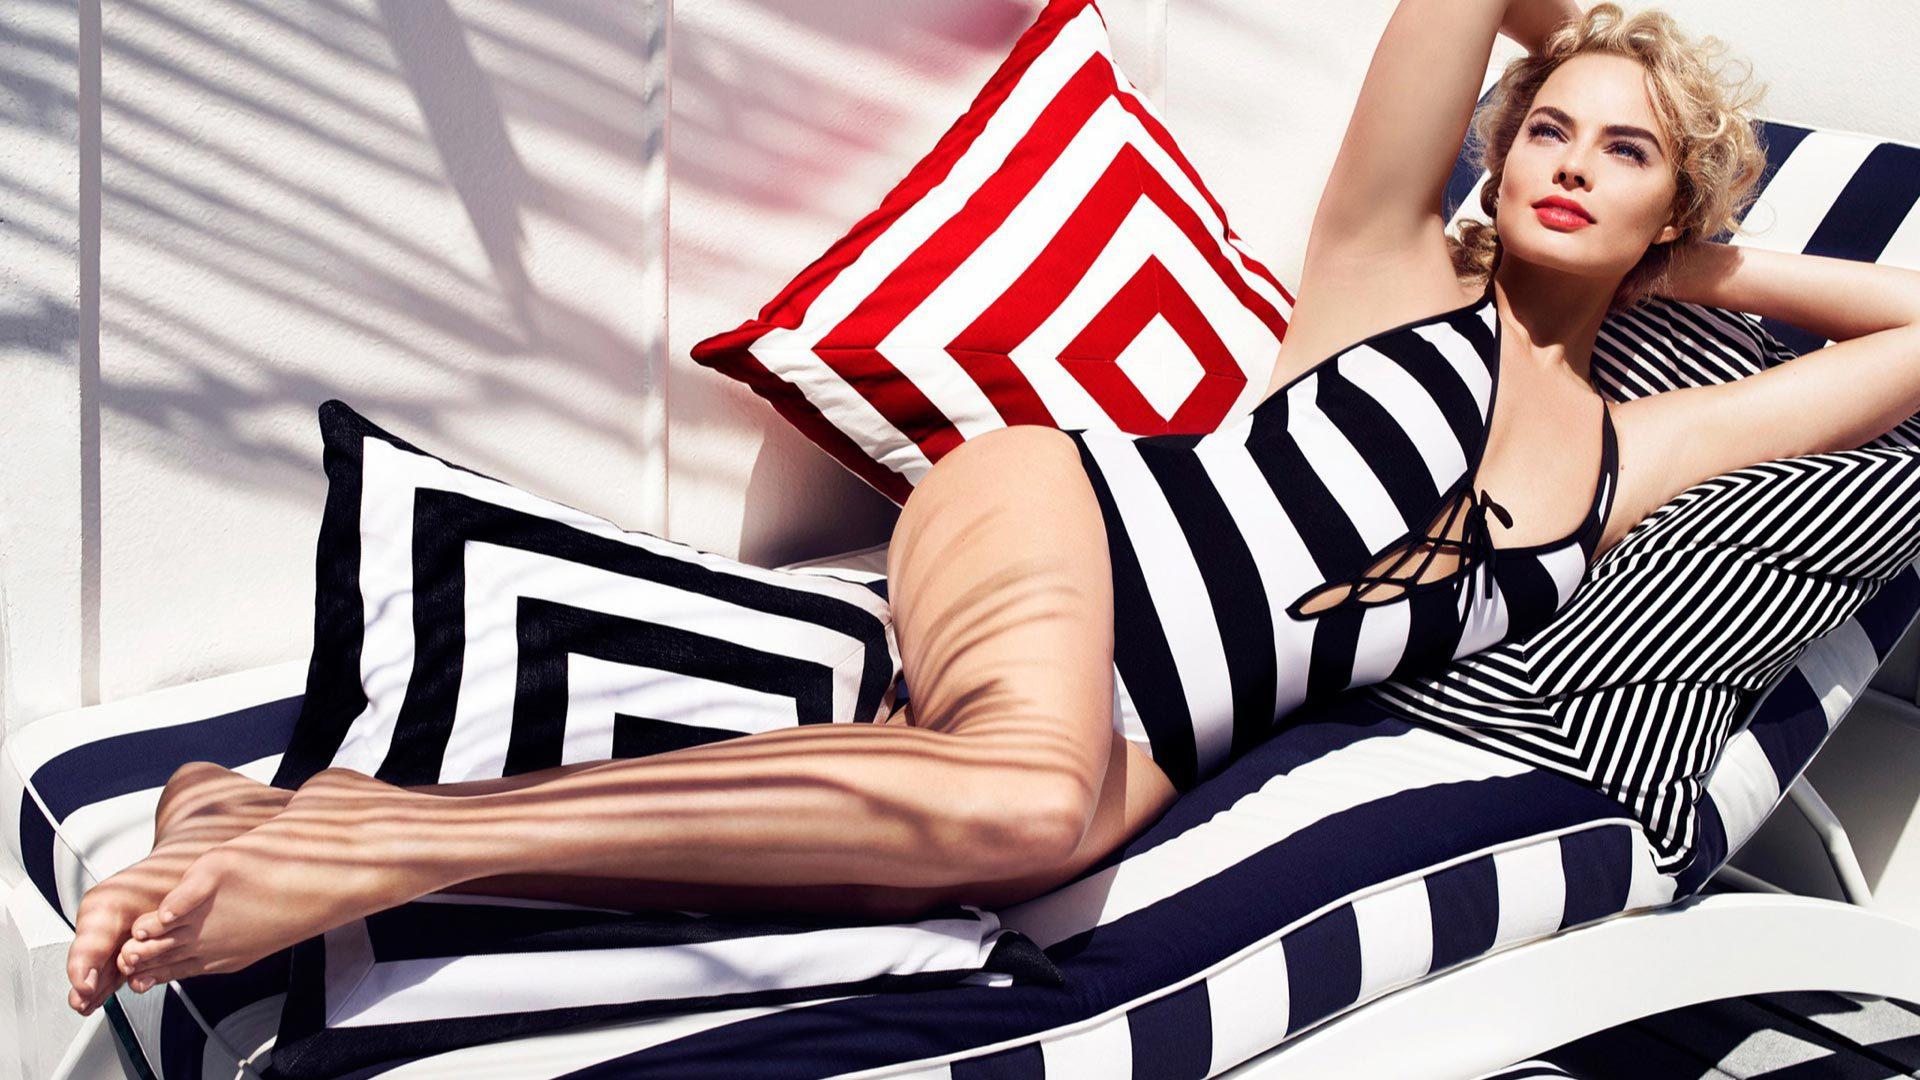 Margot Robbie Widescreen